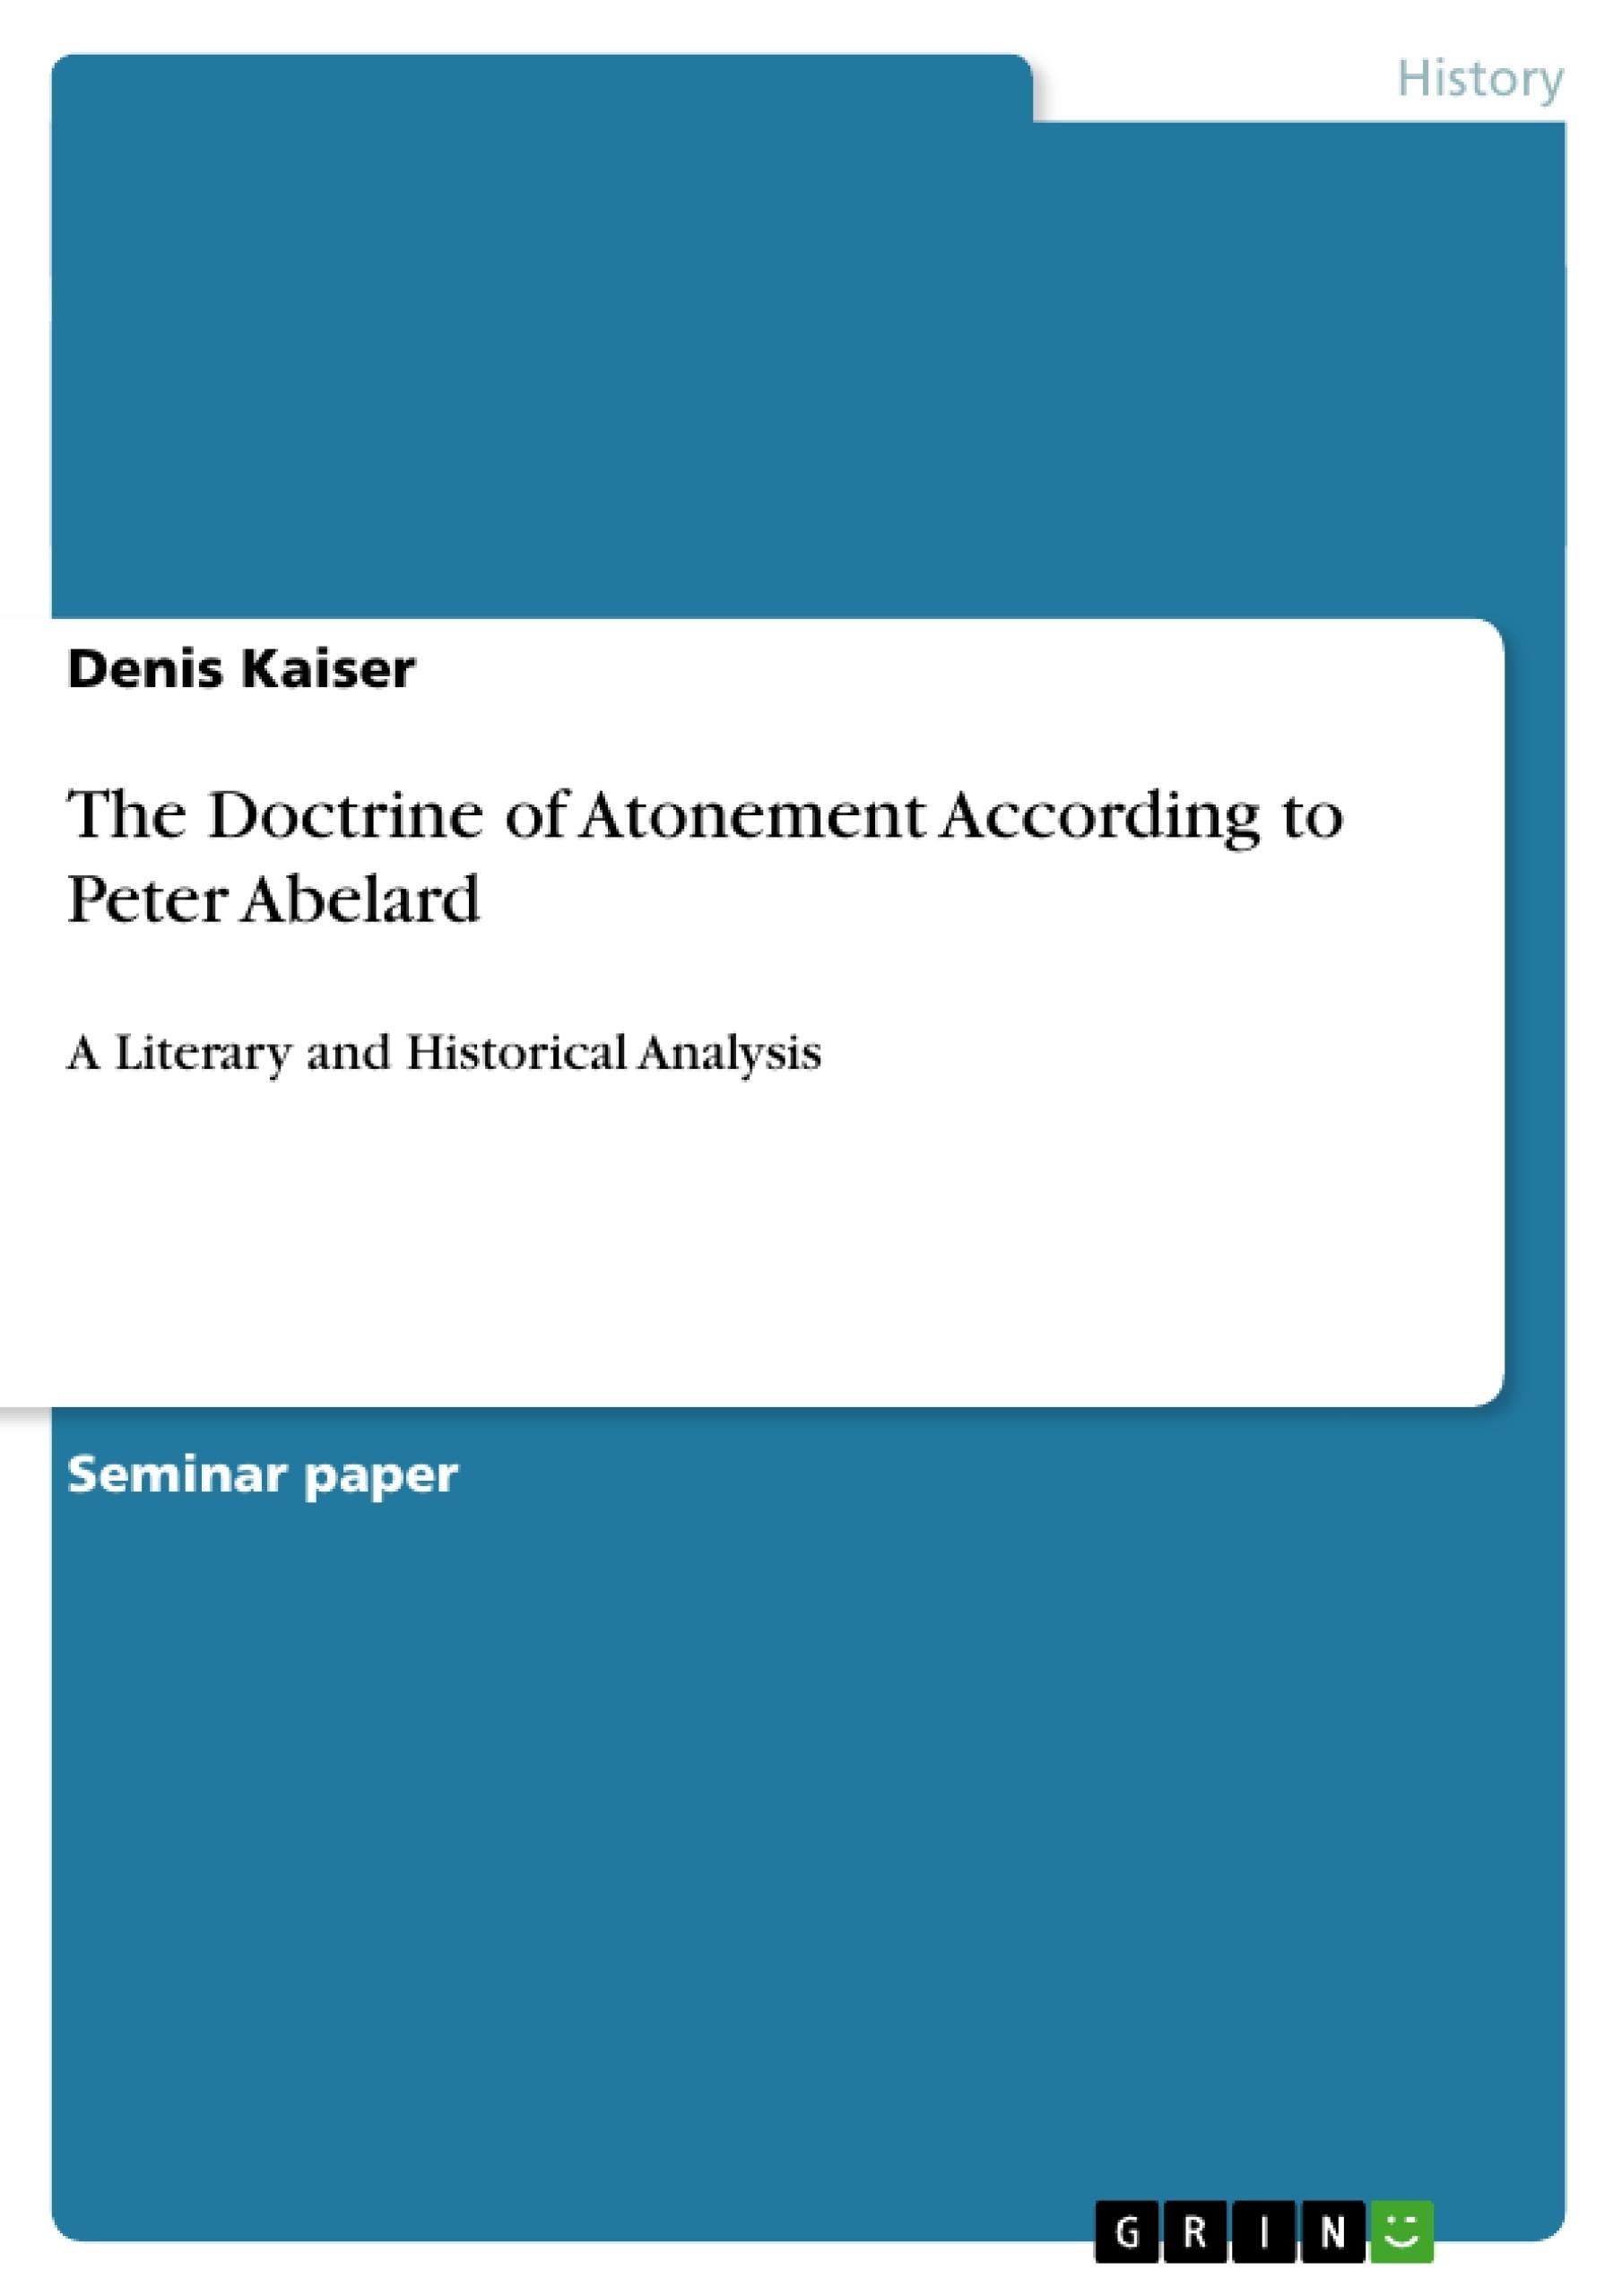 Peter abelard essay